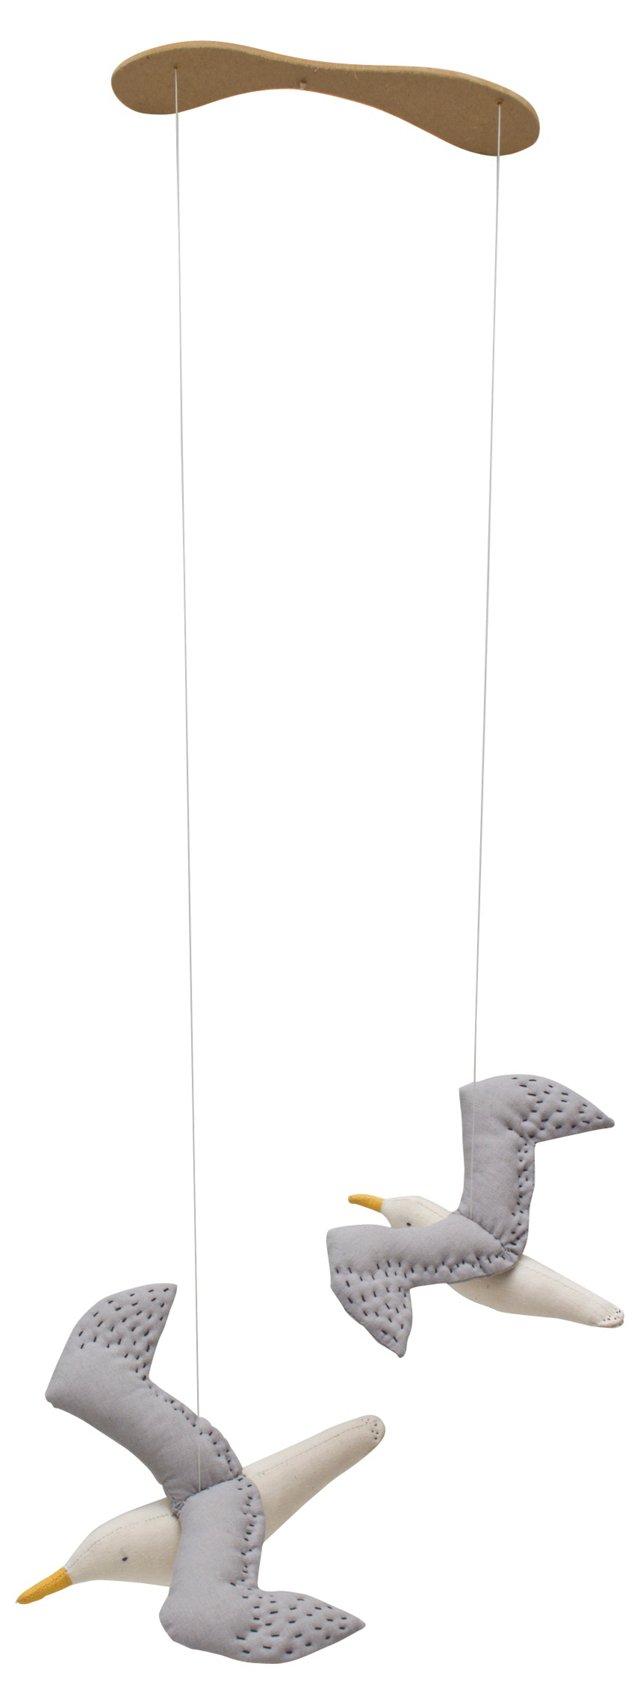 Kamomé 2 Seagulls Mobile, Gray/Blue